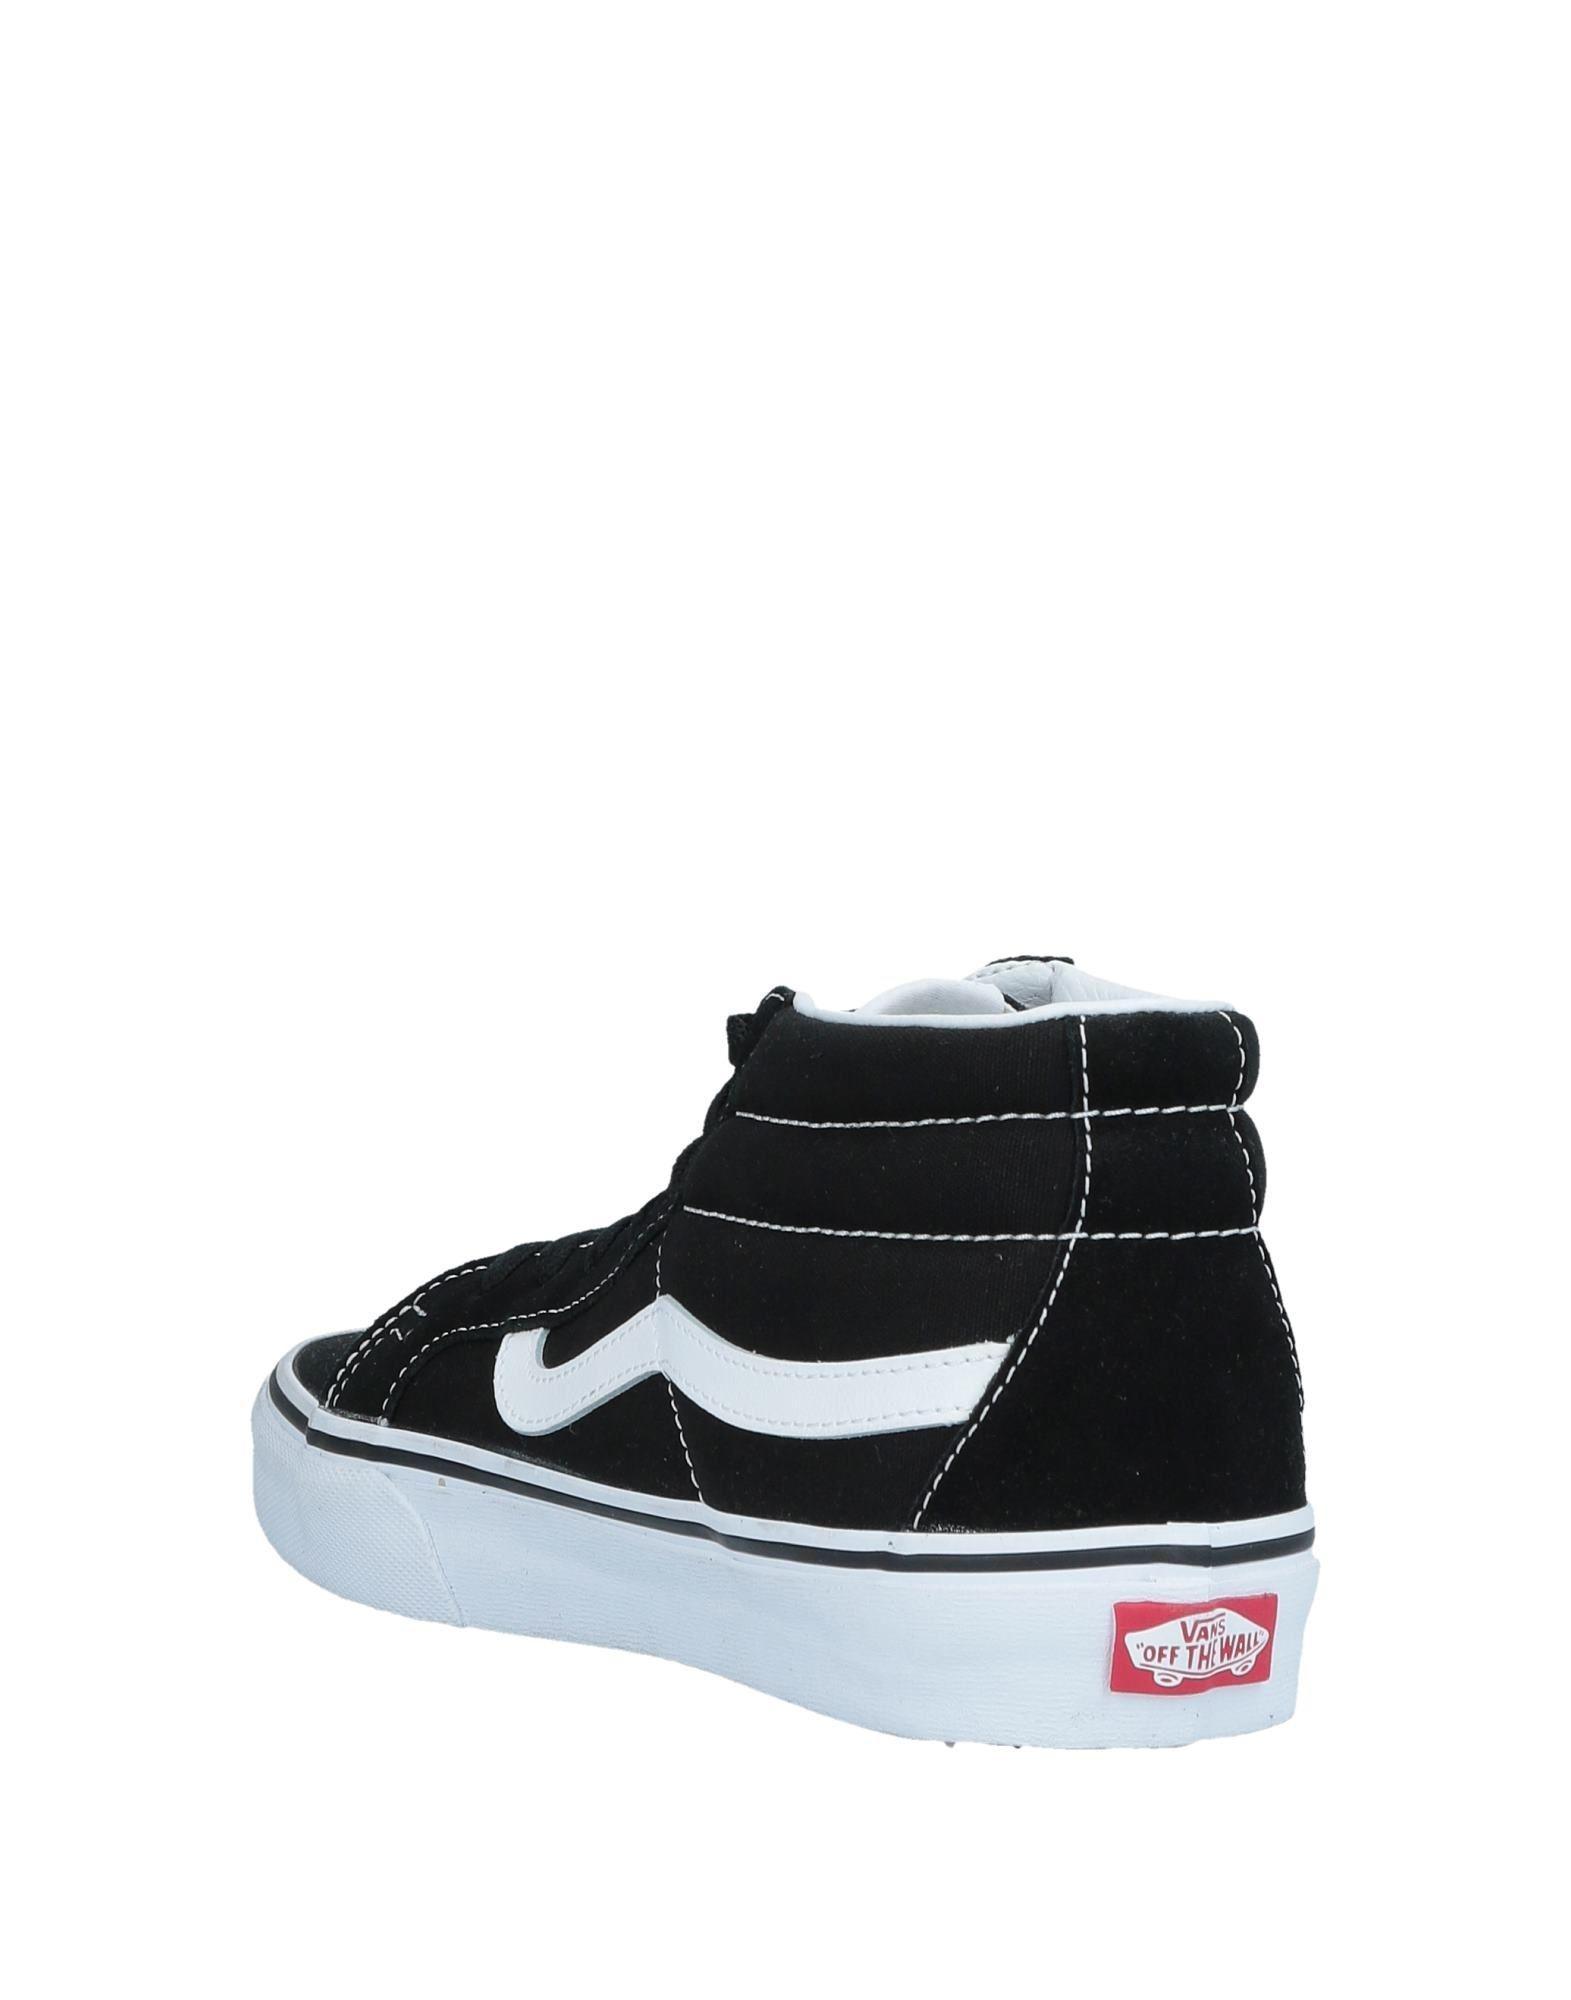 8792c68f8dbddf Lyst - Vans High-tops   Sneakers in Black for Men